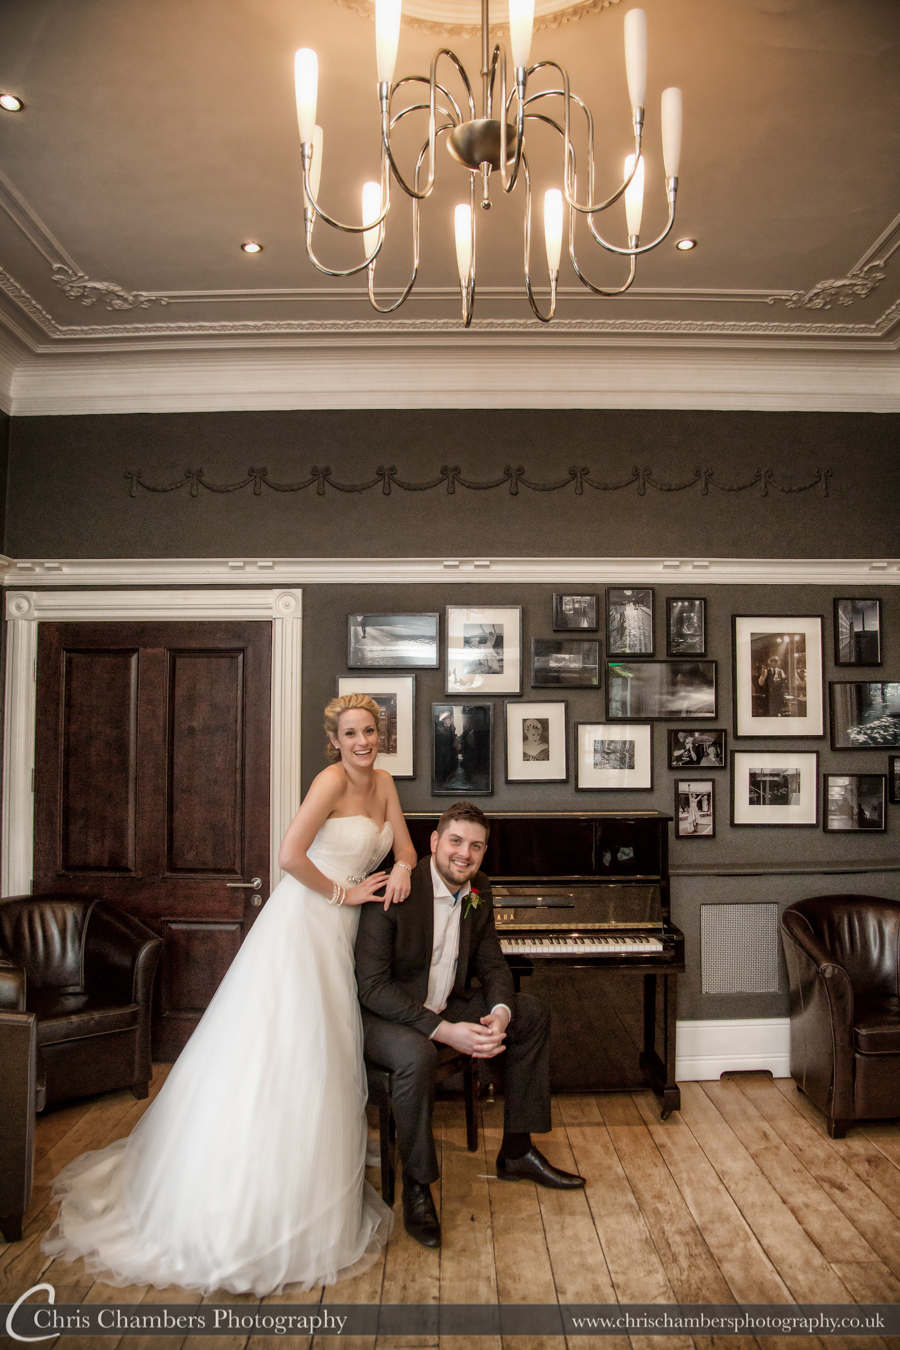 Woodland Wedding Photography | Chris Chambers Photography | Yorkshire Wedding Photographer | Award winning leeds wedding photographer | Wedding Photography at Woodlands Hotel | Leeds wedding Photographer | Yorkshire wedding photography